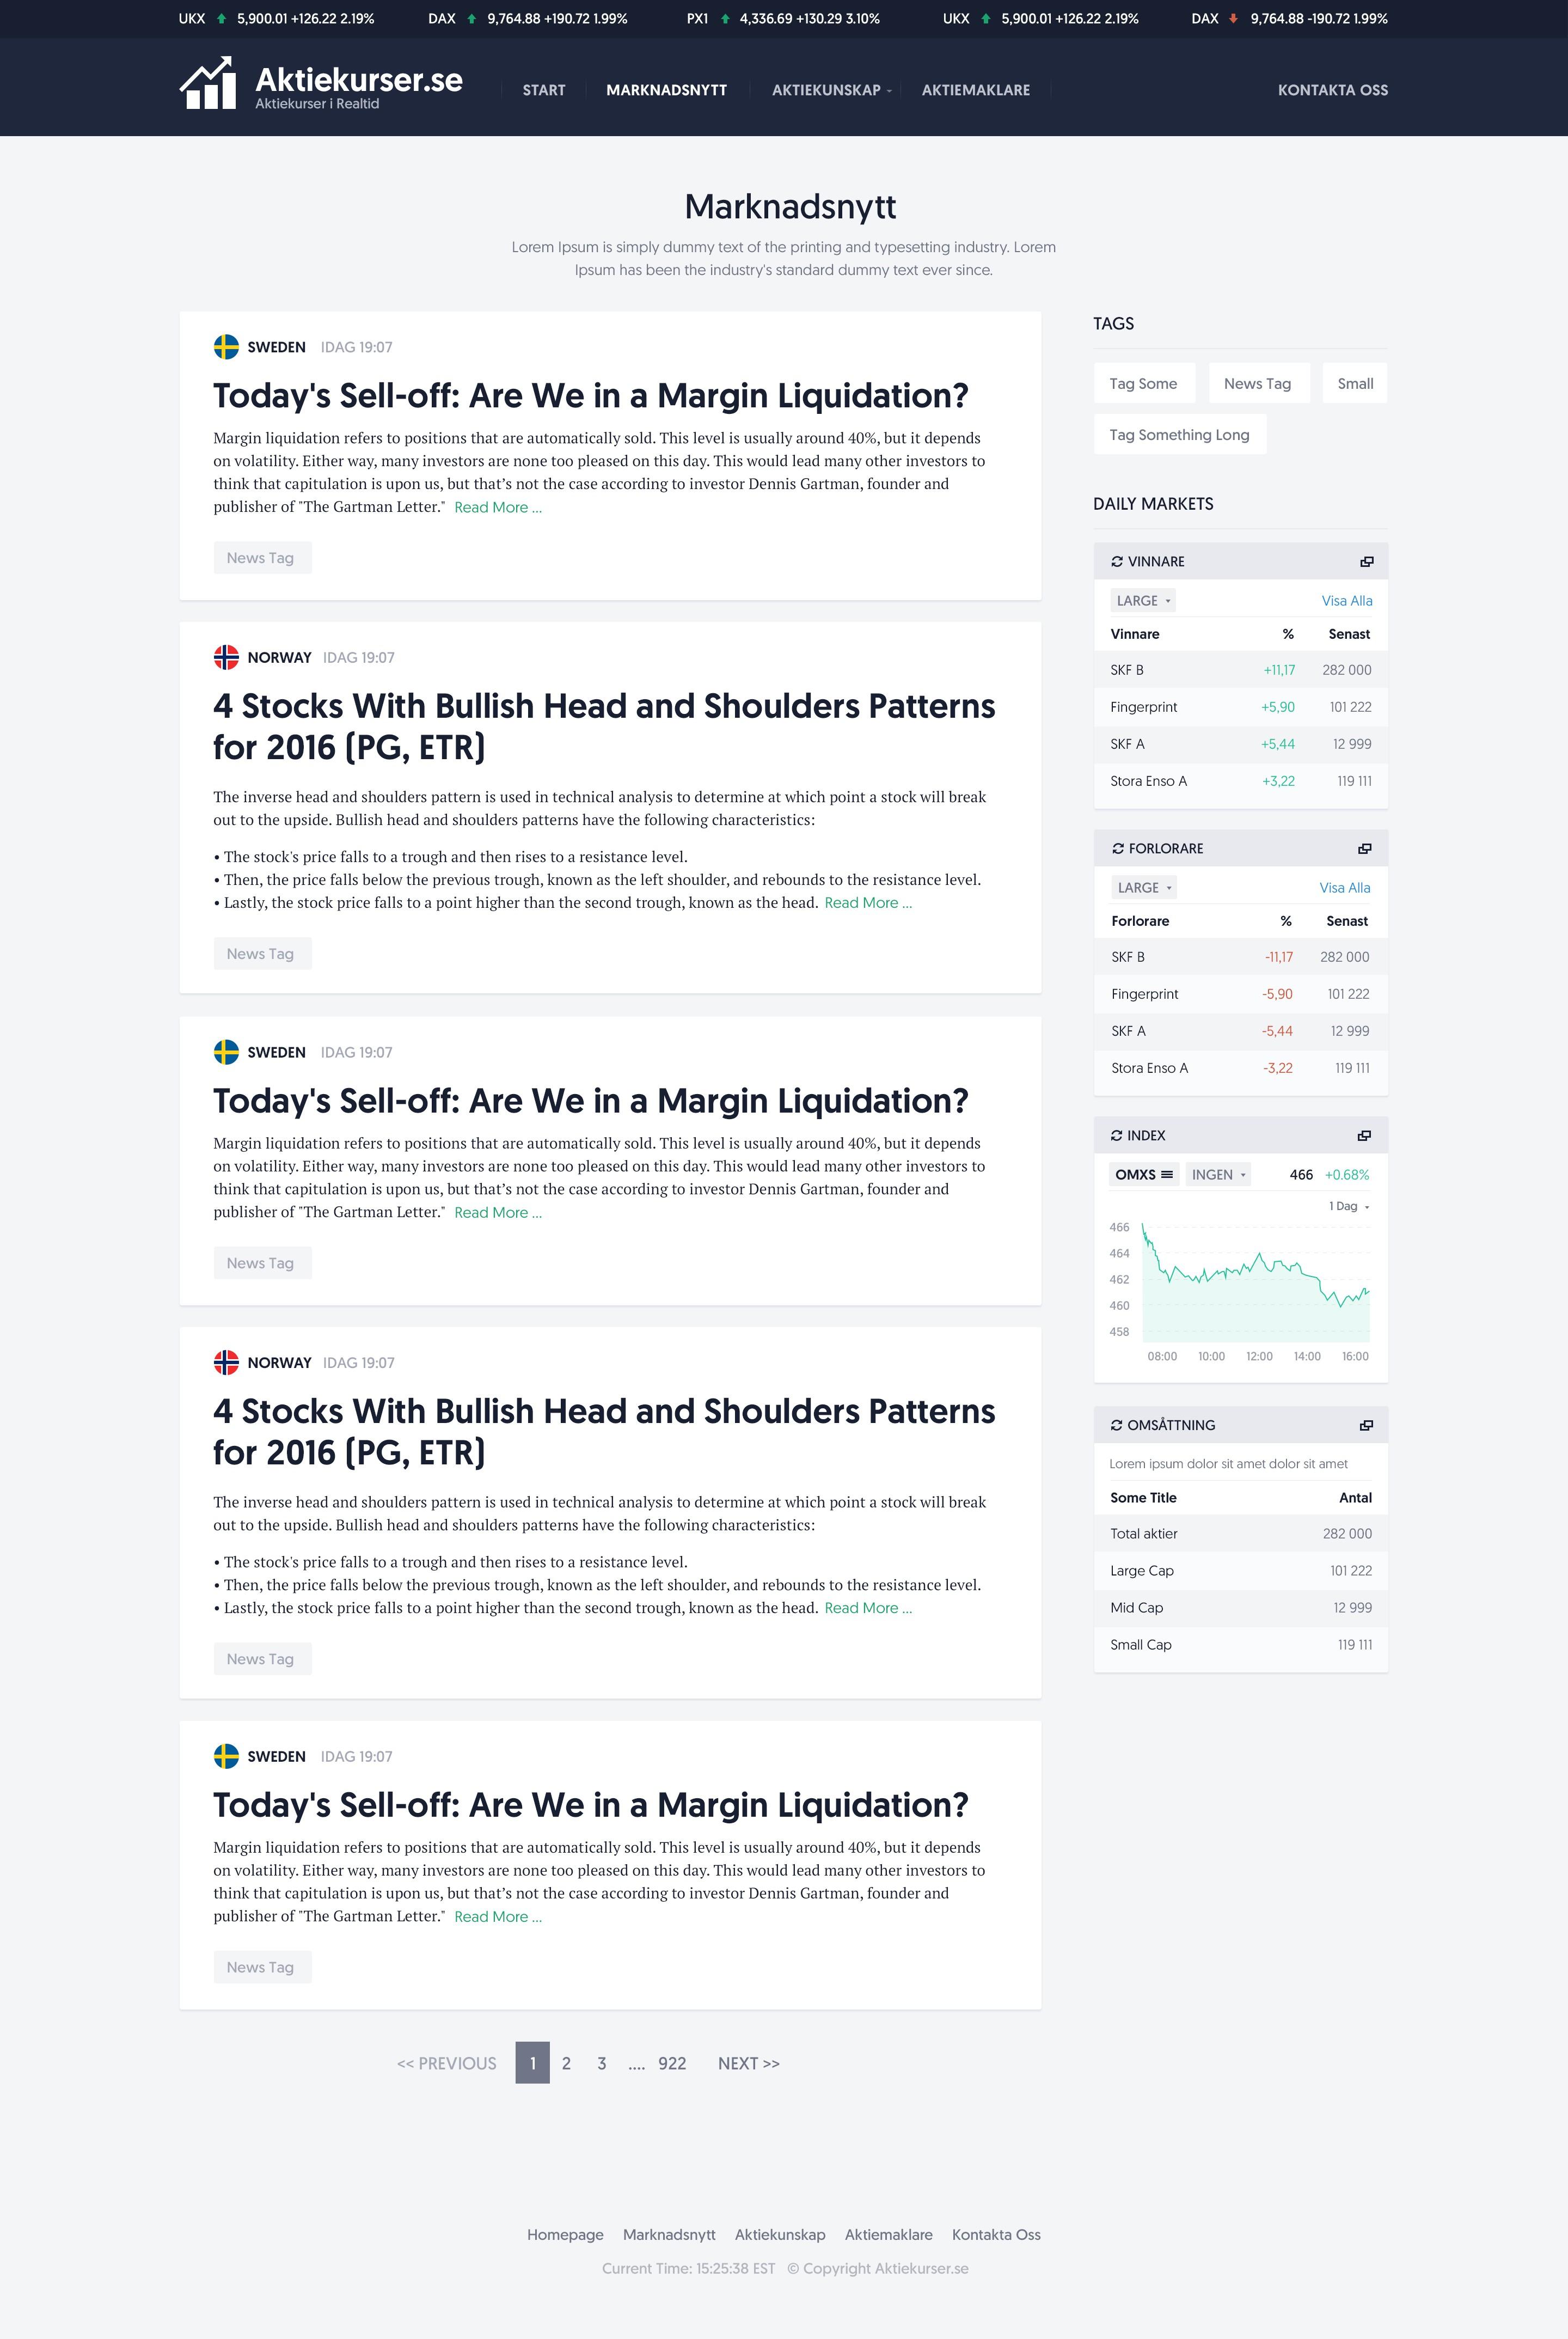 Aktiekurser.se Website Design